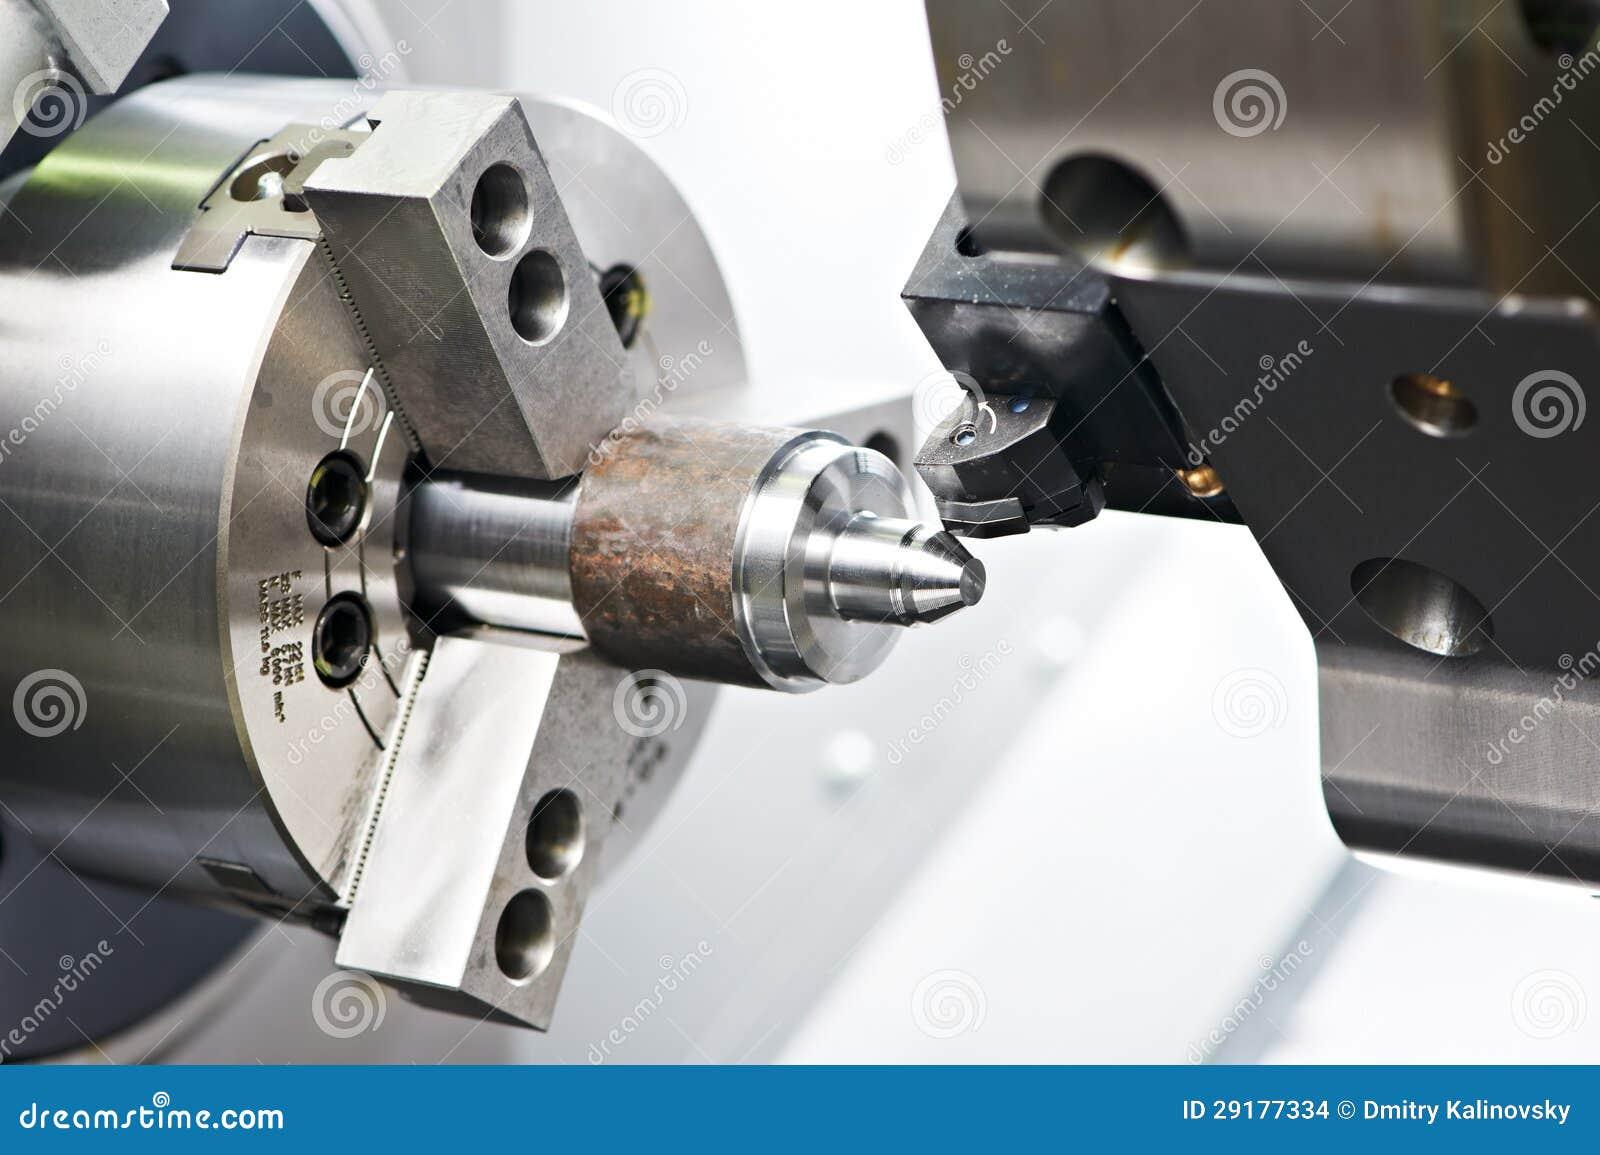 metal blank machining process stock photo image 29177334